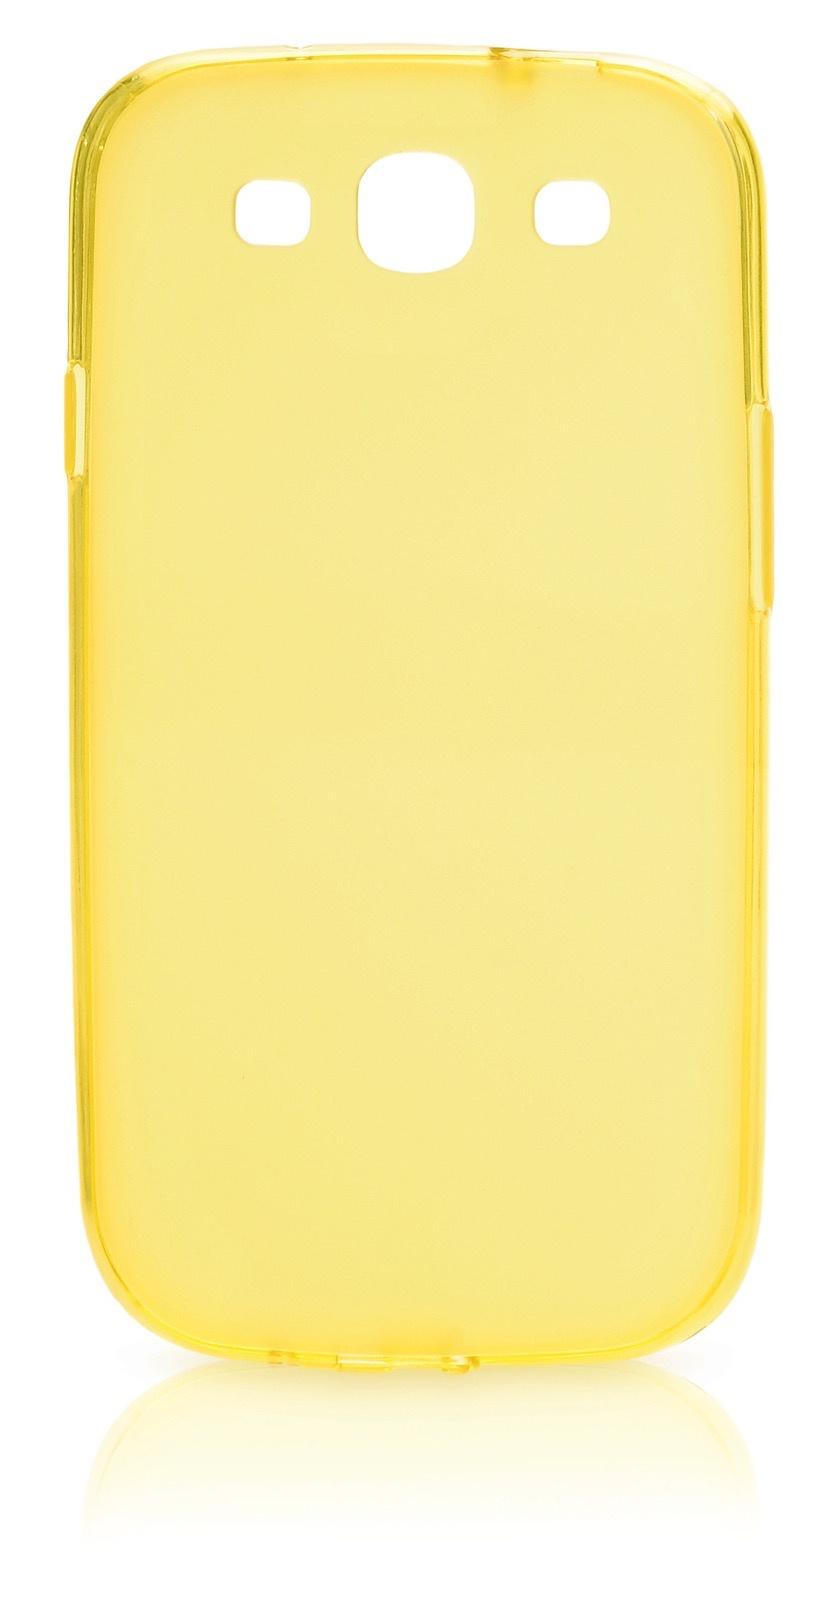 Чехол накладка Gurdini силикон матовый 380325 для Samsung Galaxy S3,380325,желтый